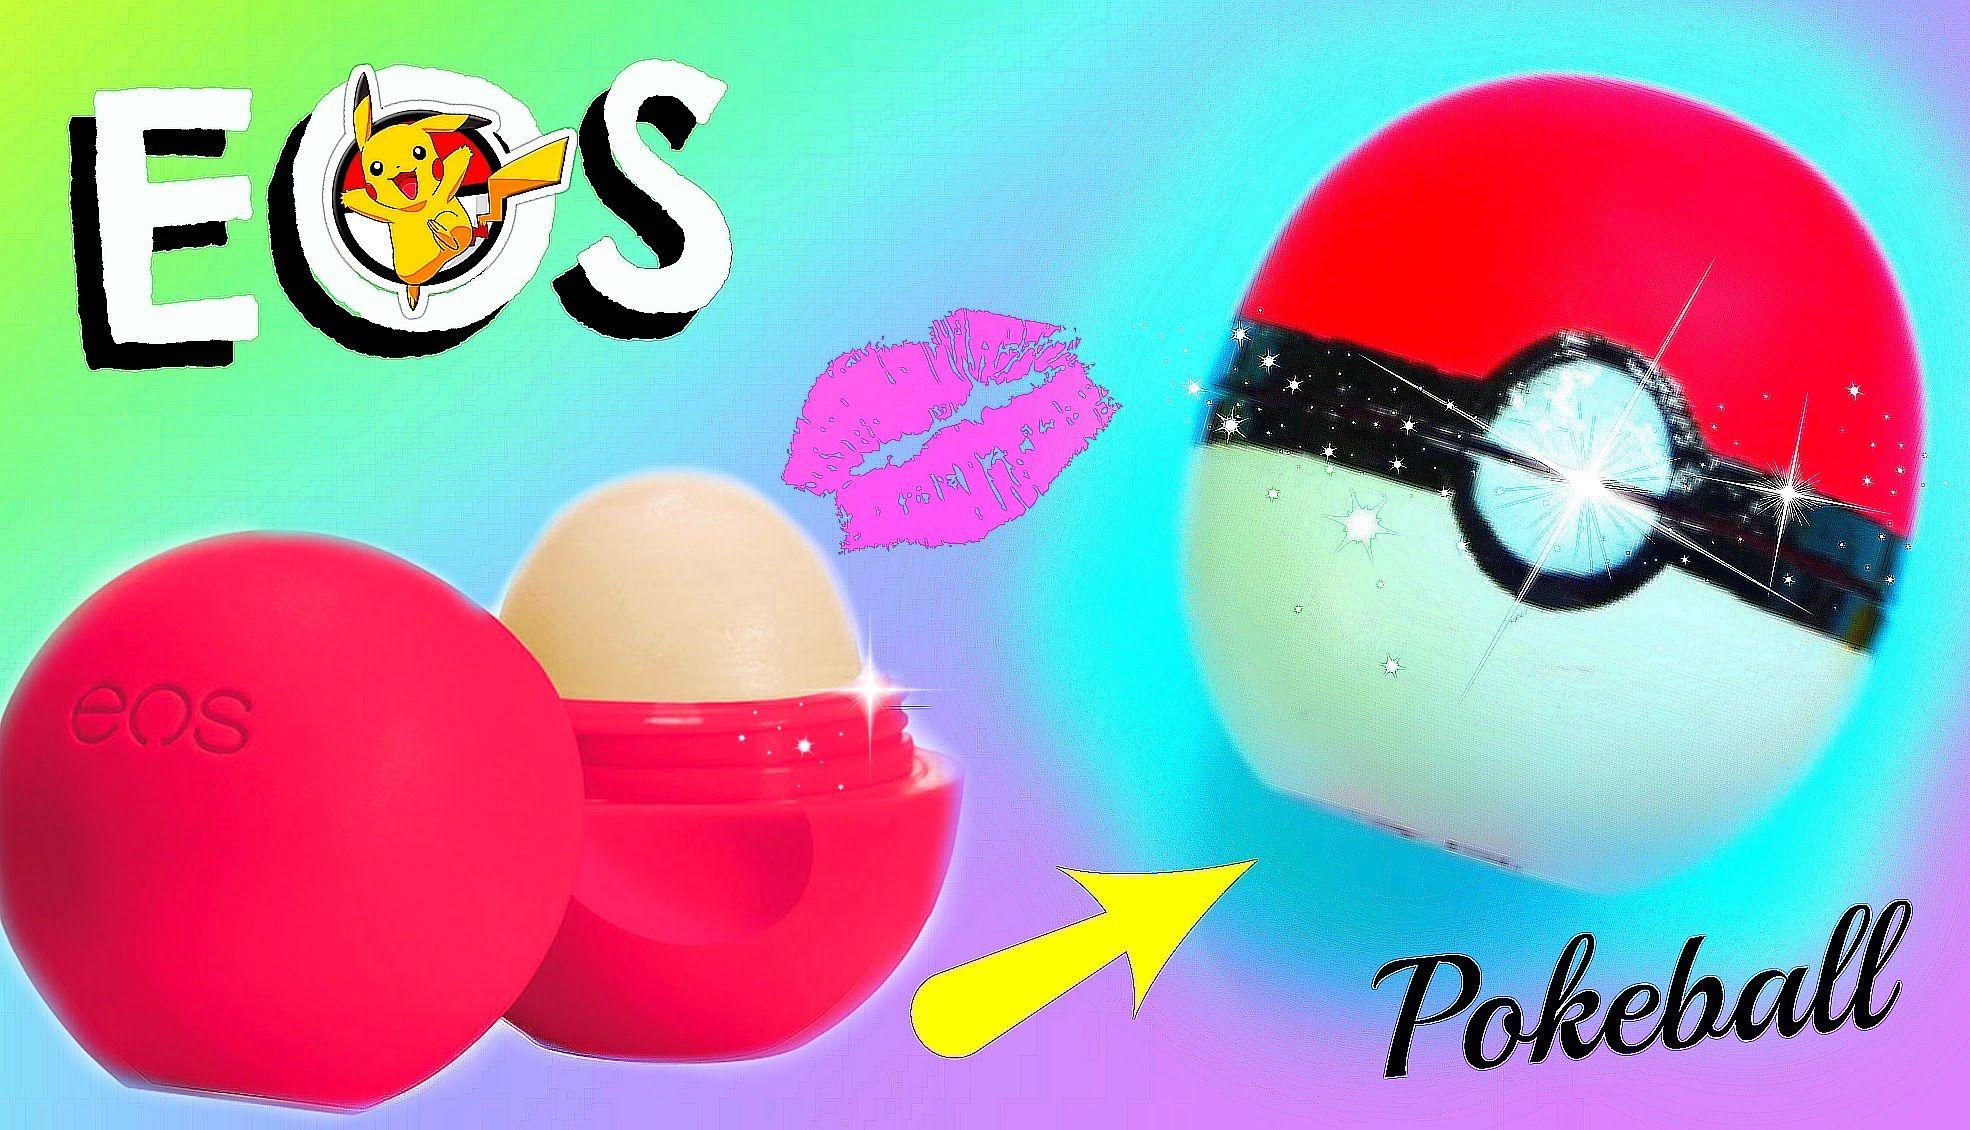 diy pokeball eos i back to school pokèmon go lipgloss selber machen